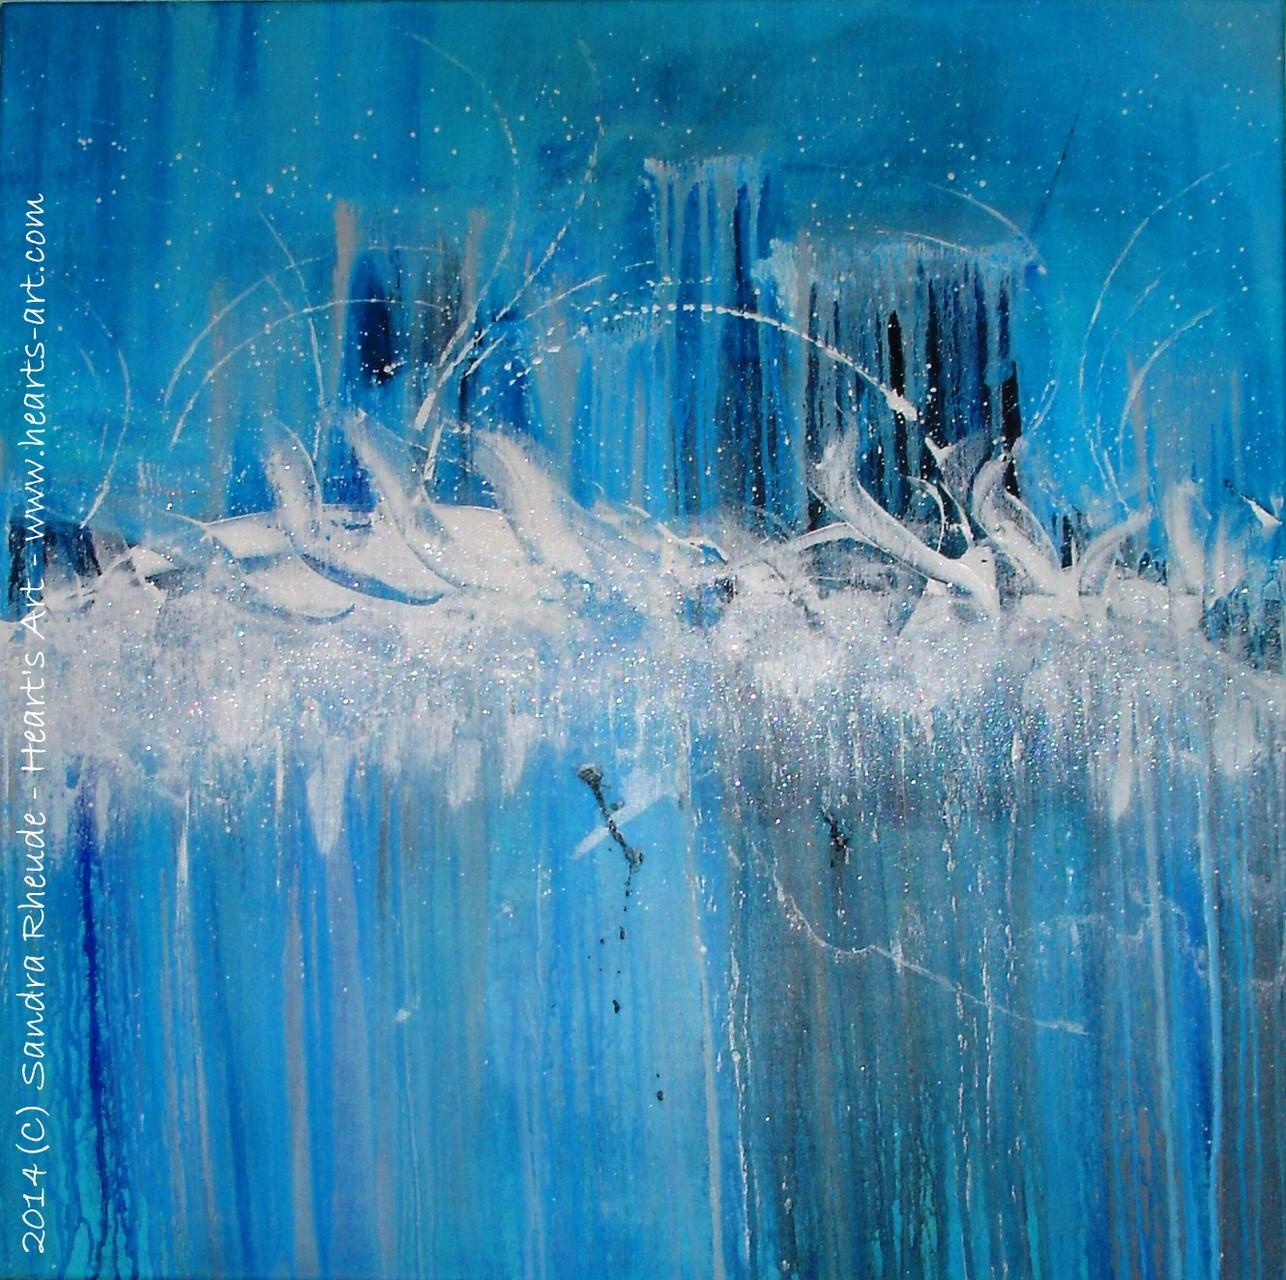 'Dolphins' Rain Dance' - 2014/16 - Acryl auf Leinwand - 70 x 70 cm - verkauft (Schweiz)